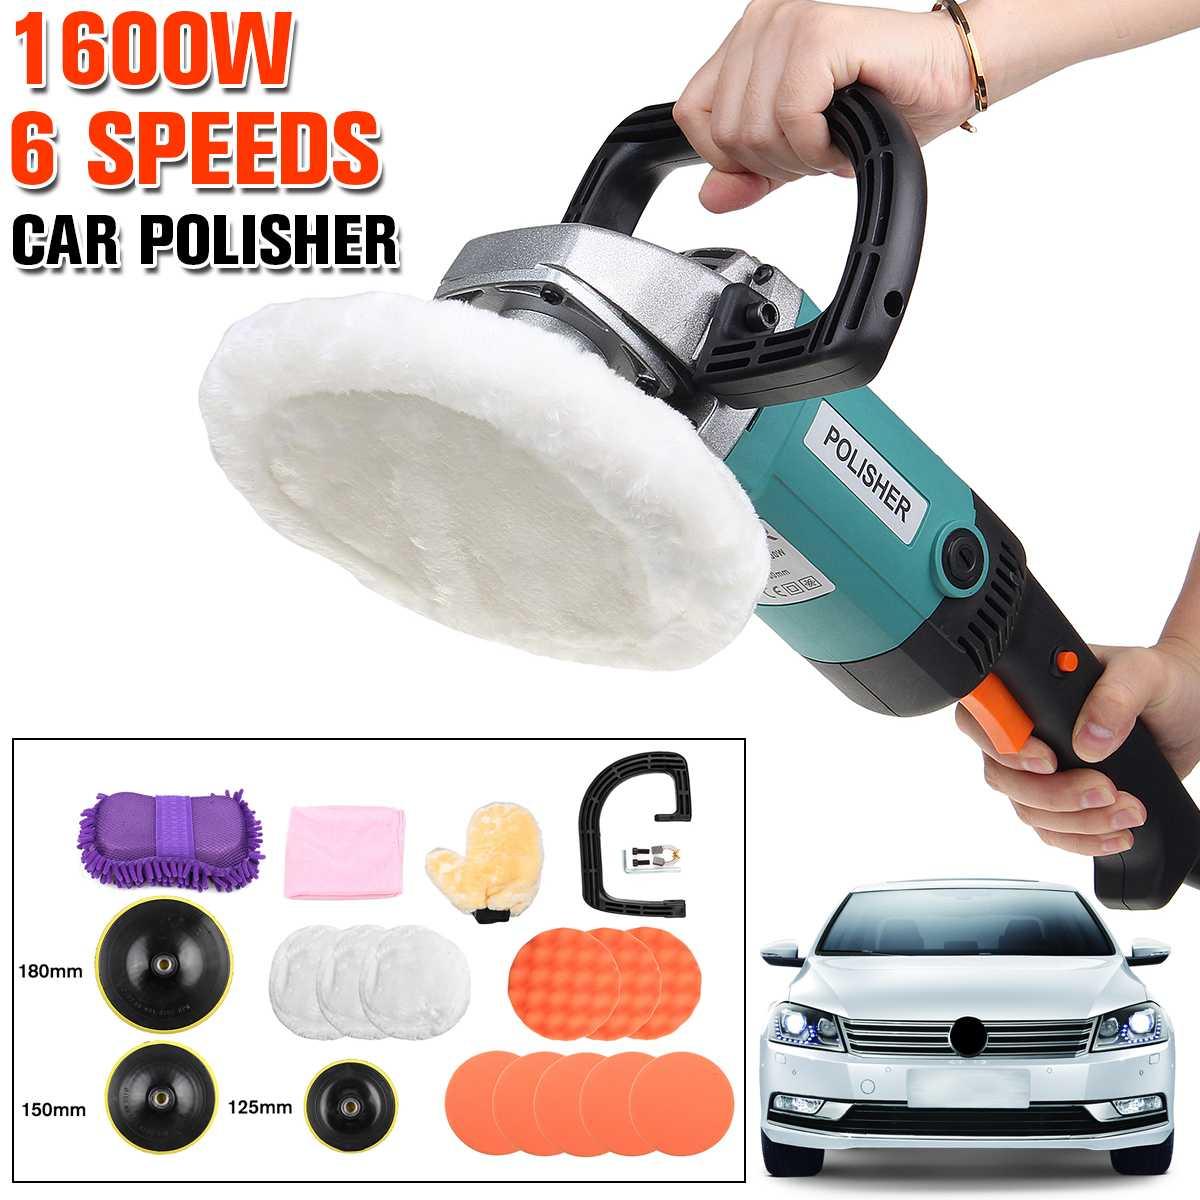 17Pcs/Set Car Wax Polisher 1600W Variable Speed 3000rpm Car Paint Care Tool Electric Polishing Machine Sander 220-240V